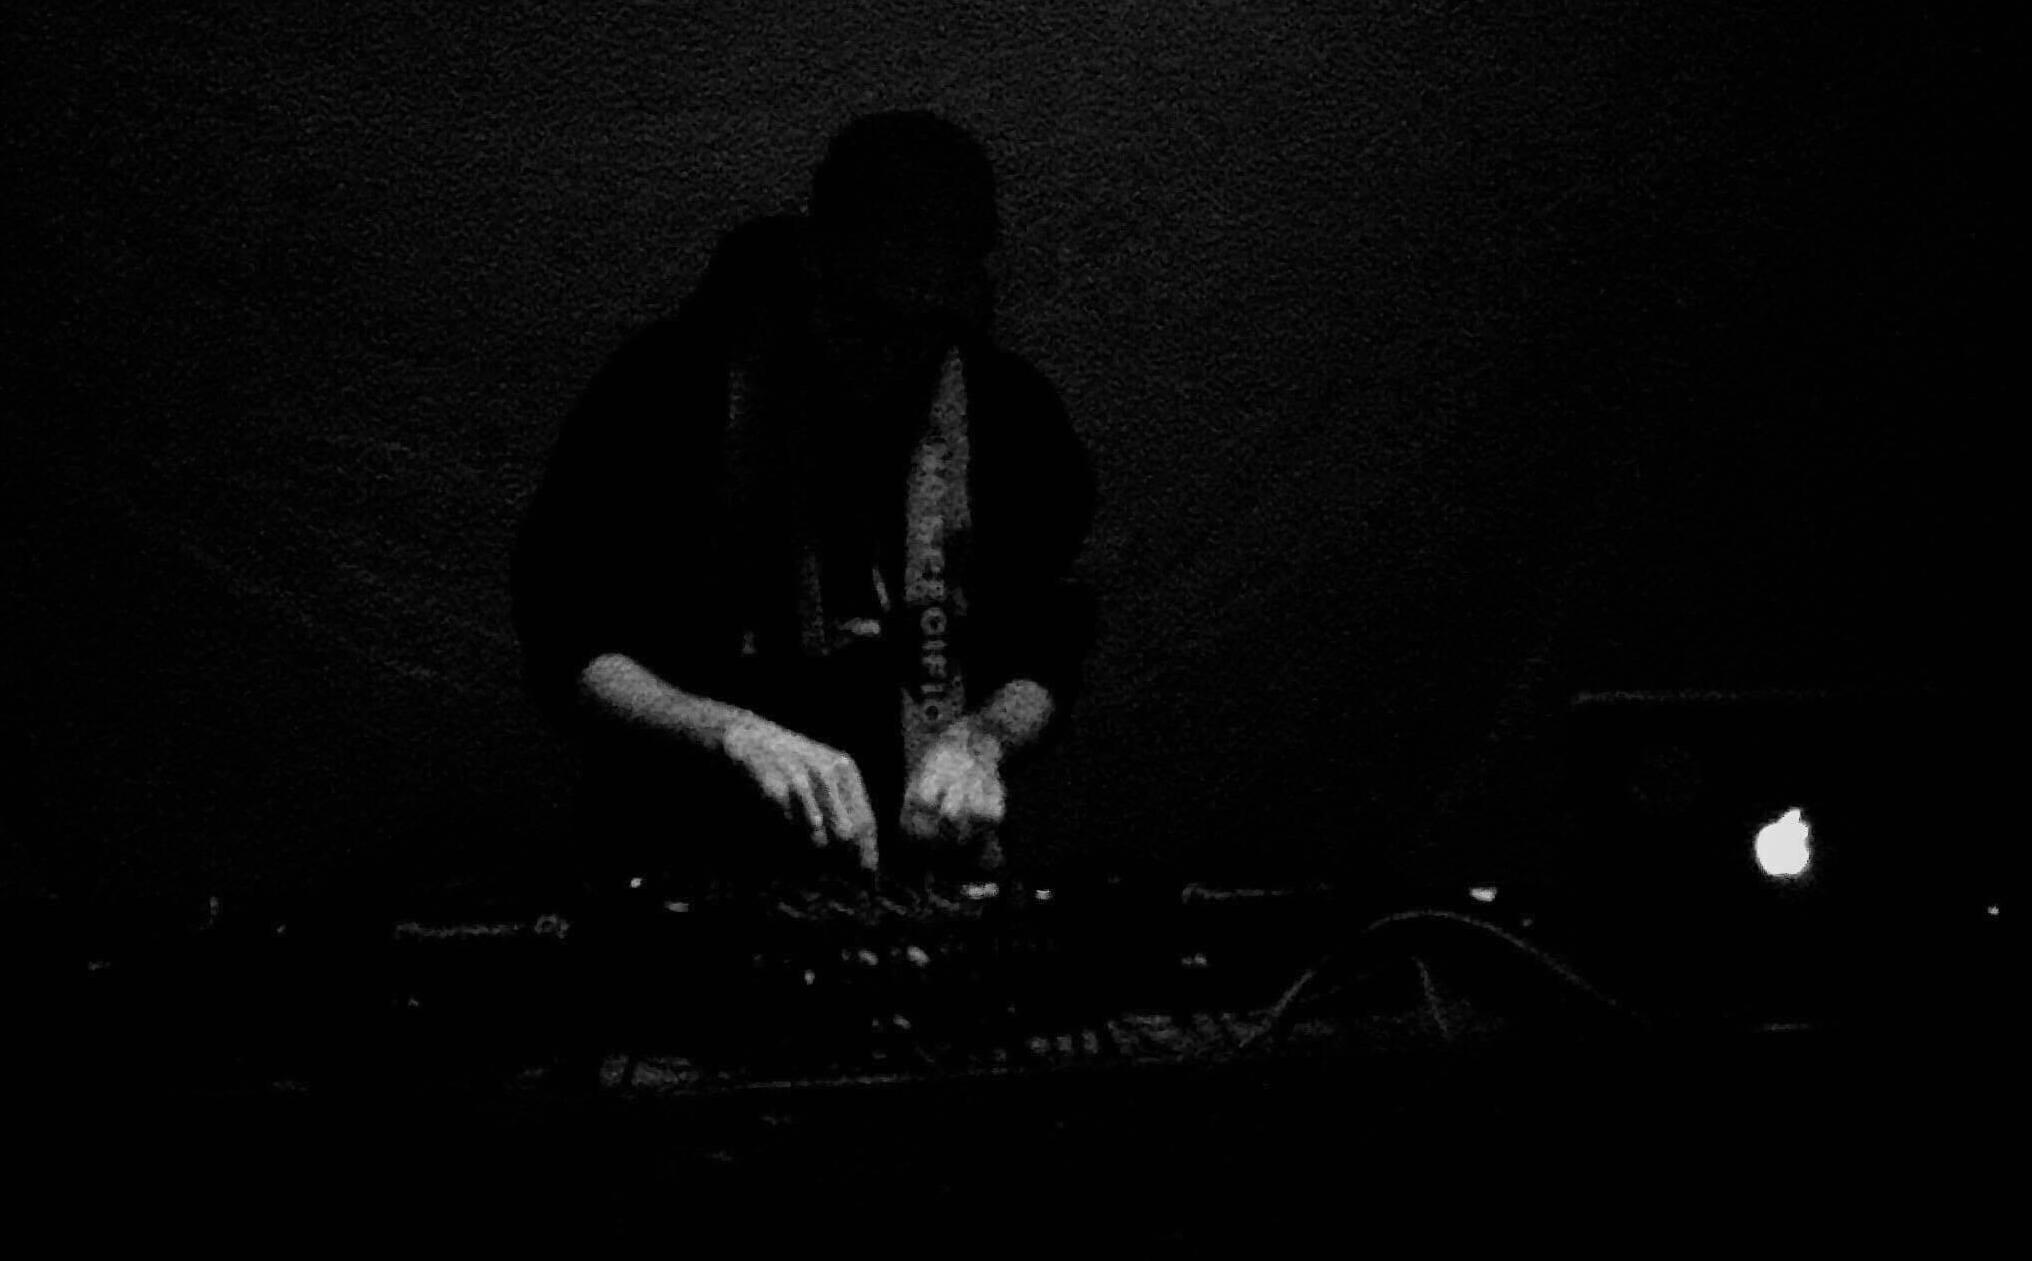 Playlista: Lensk i skandynawska muzyka eksperymentalna